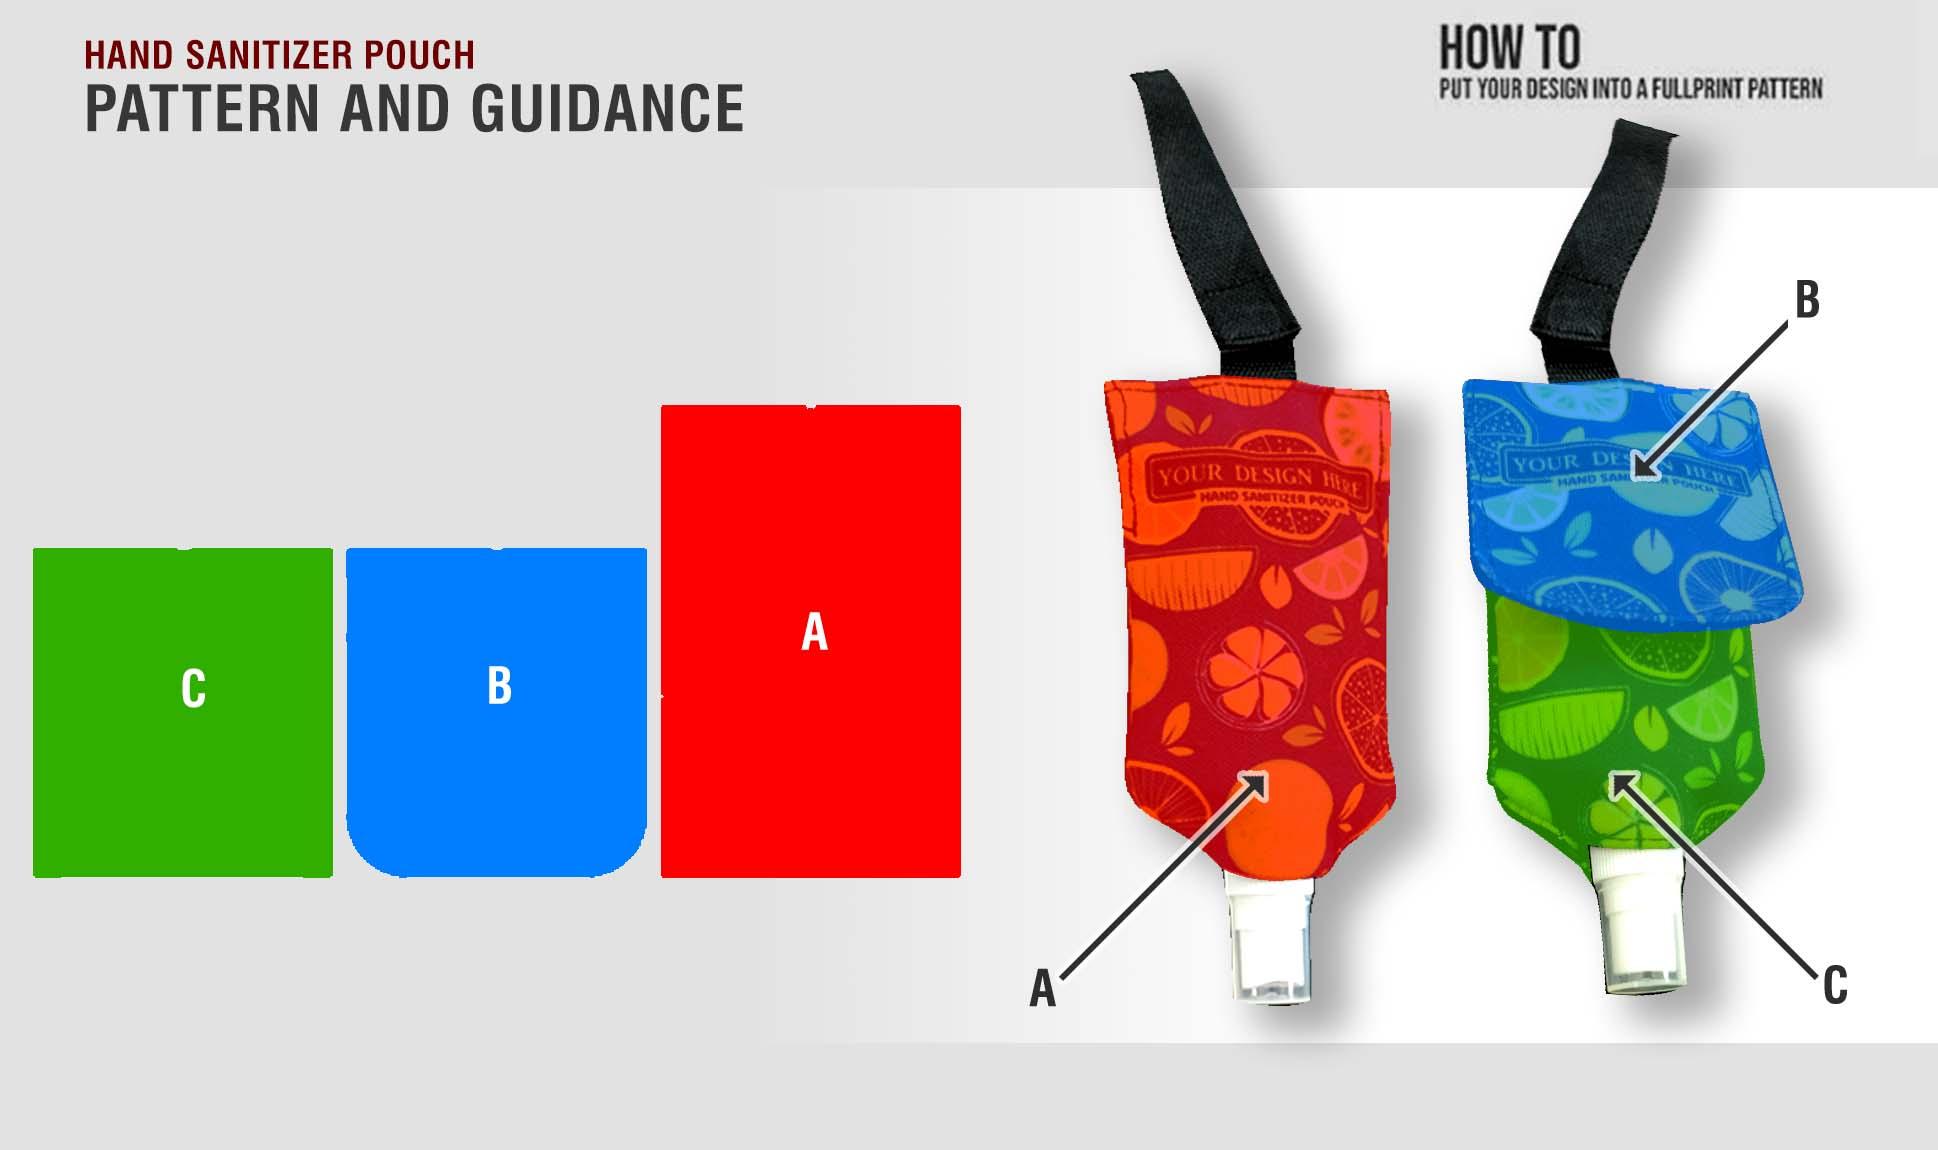 hand sanitizer pouch 1